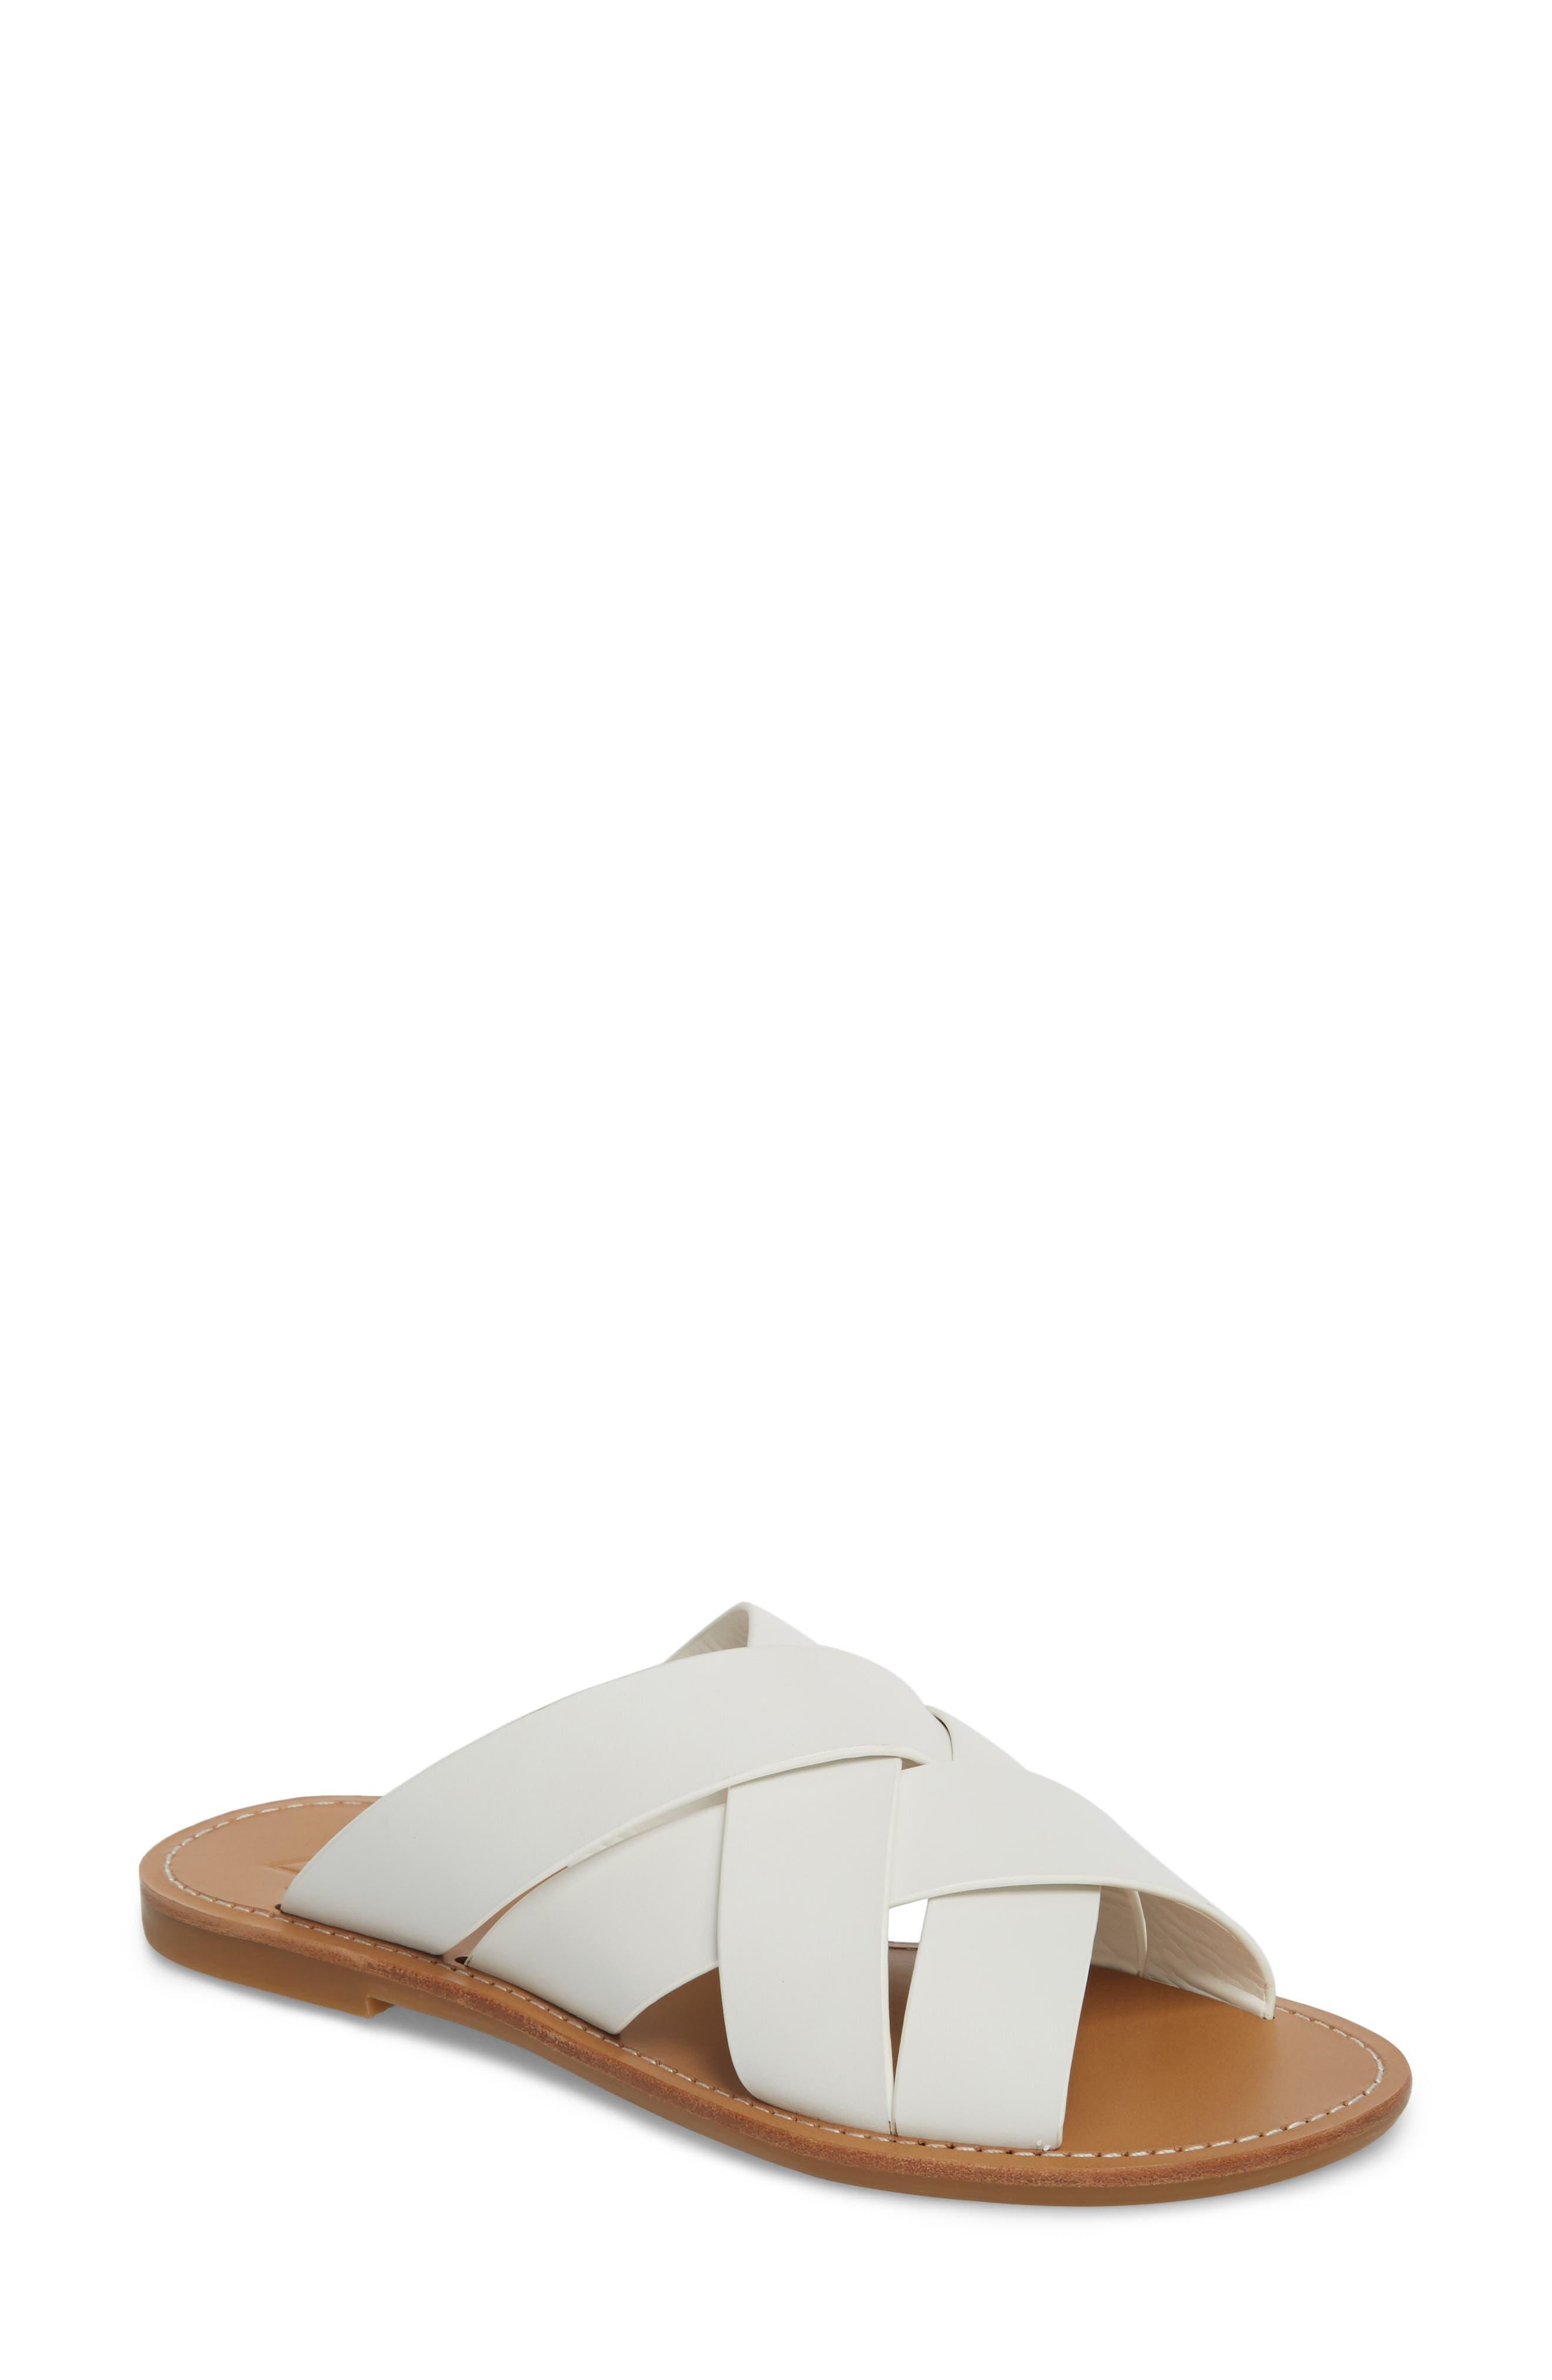 Raida Slide Sandal,                         Main,                         color, White Leather